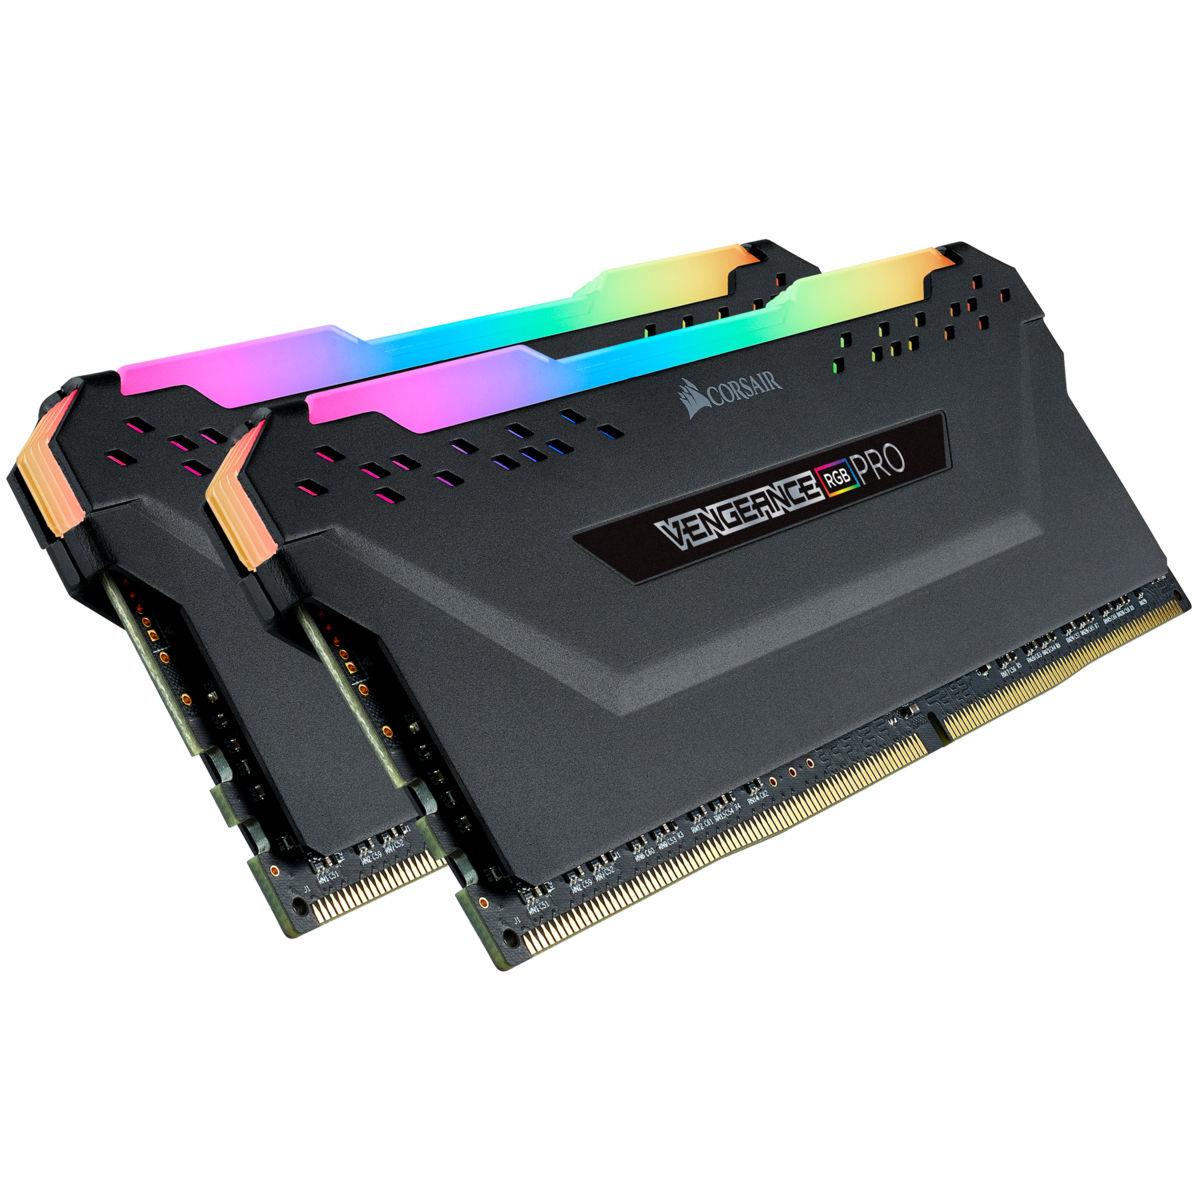 Corsair CMW16GX4M2D3600C18 16GB